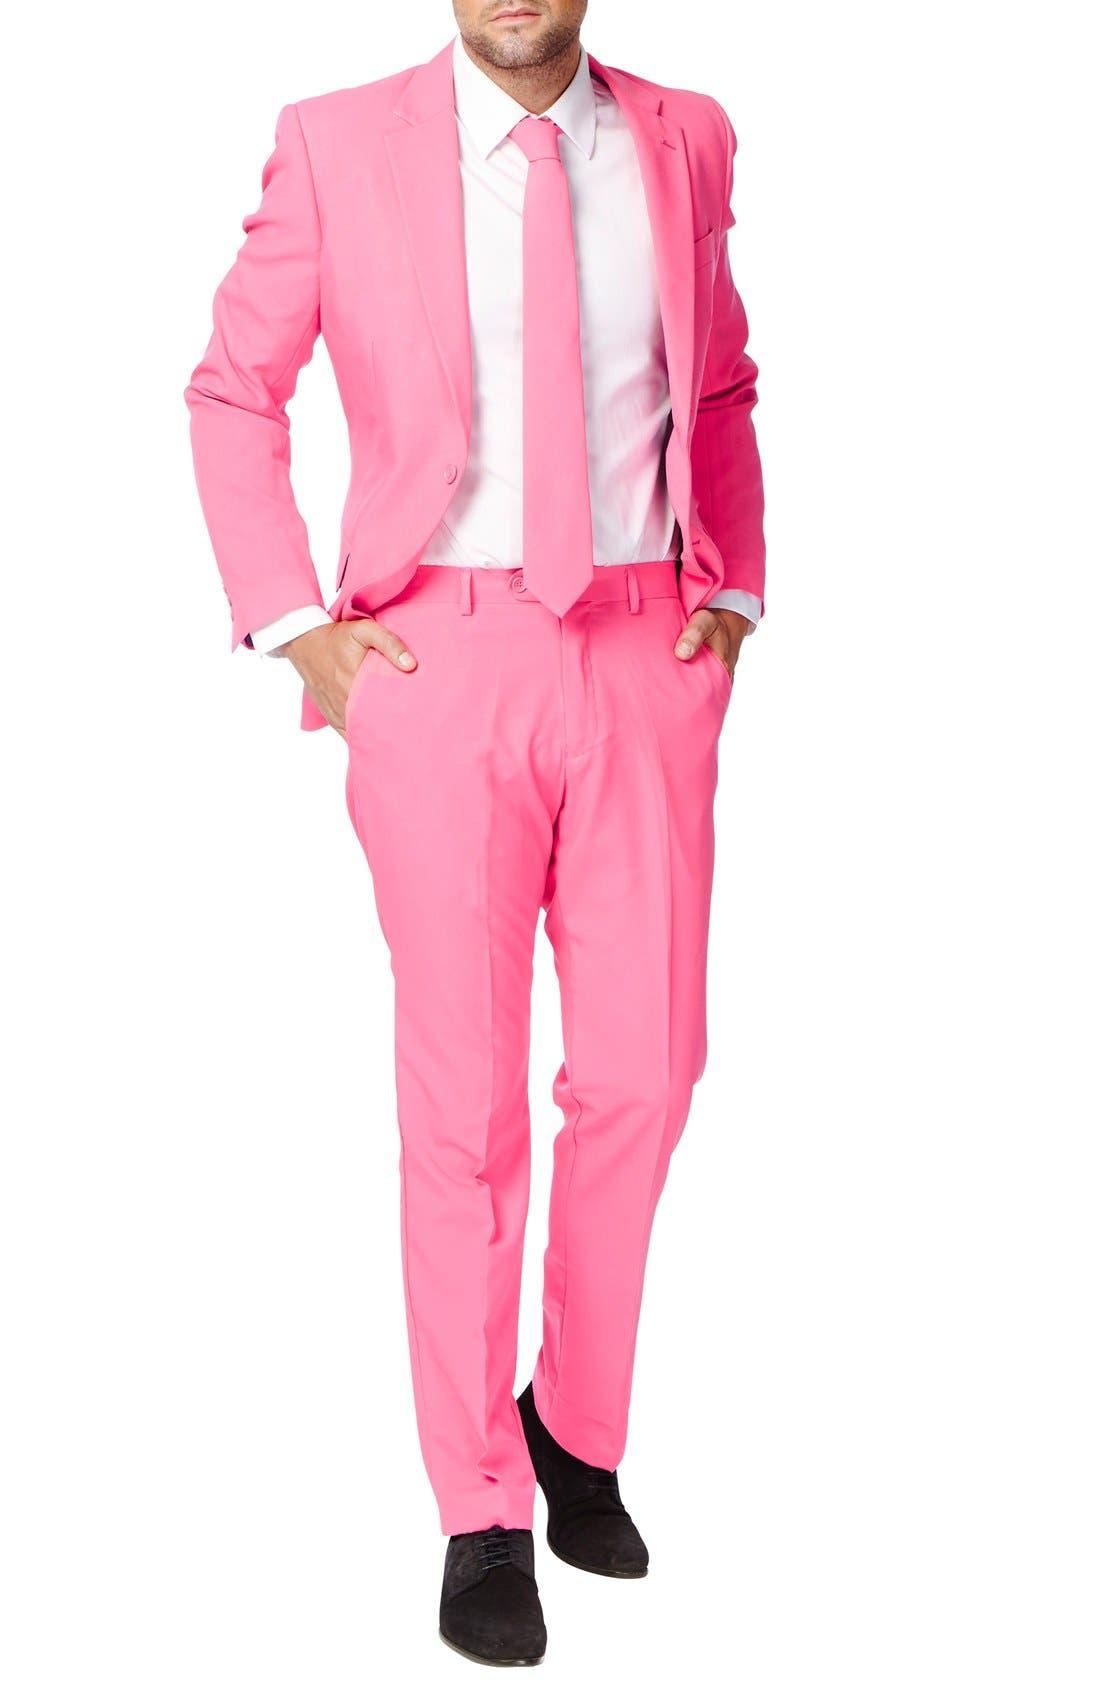 'Mr. Pink' Trim Fit Two-Piece Suit with Tie,                             Main thumbnail 1, color,                             650